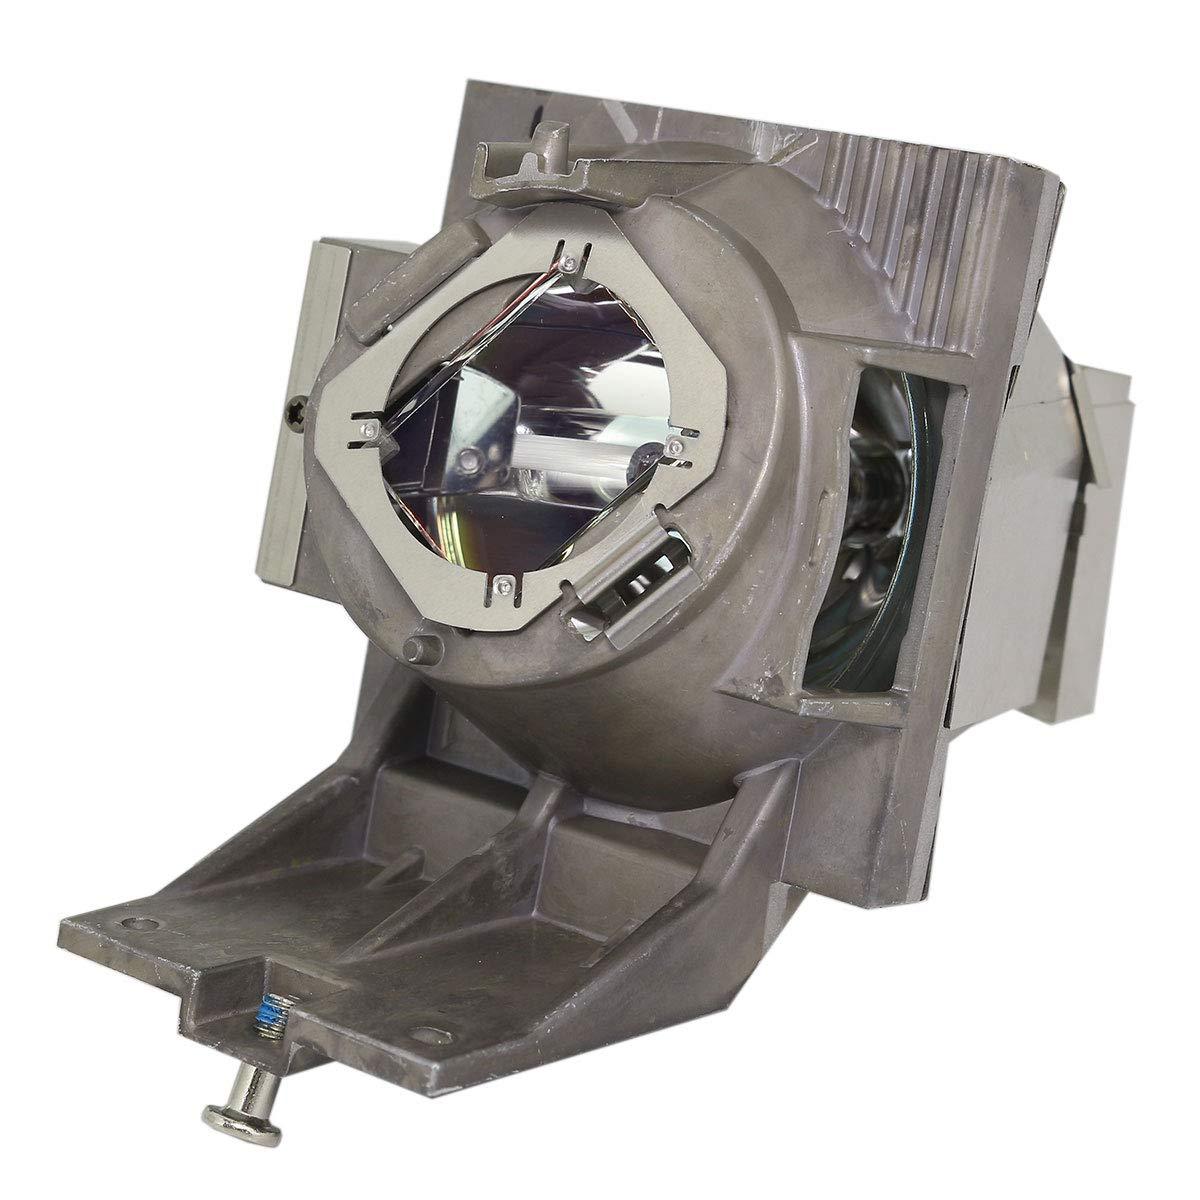 SpArc OEMプロジェクター交換用ランプ 囲い/電球付き Viewsonic PX747-4K用 Platinum (Brighter/Durable) B07MPTKW39 Lamp with Housing Platinum (Brighter/Durable)